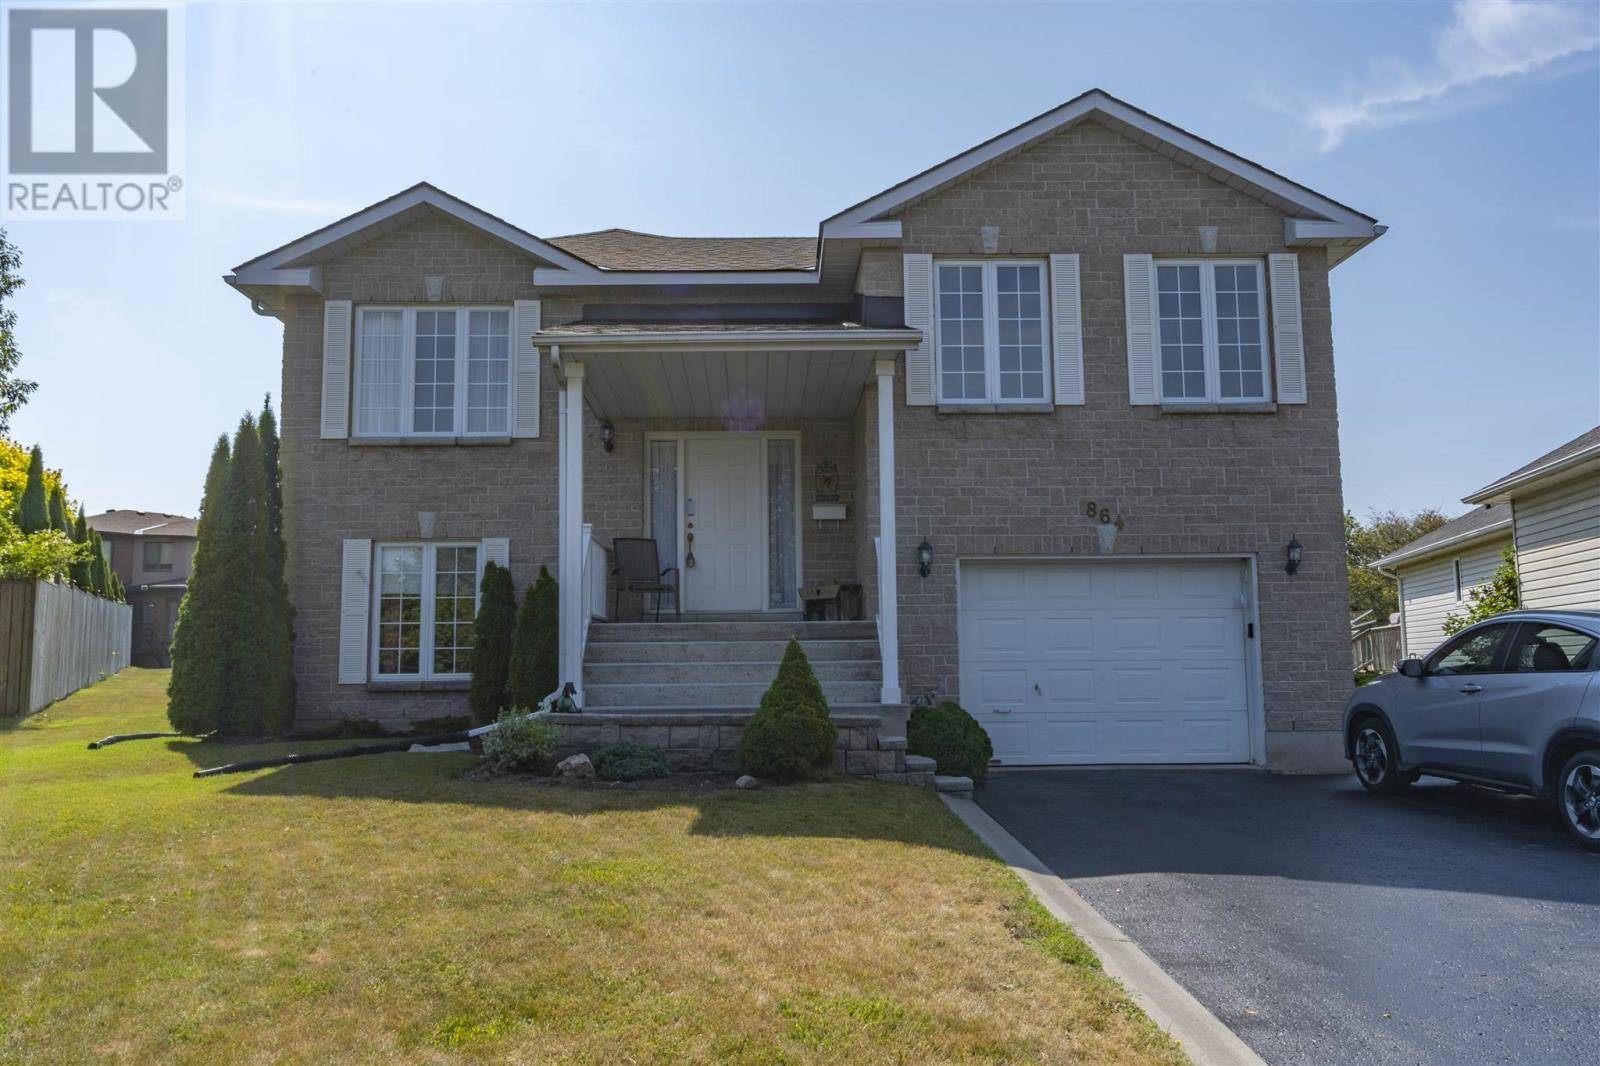 House for sale at 864 Ringstead St Kingston Ontario - MLS: K19005028